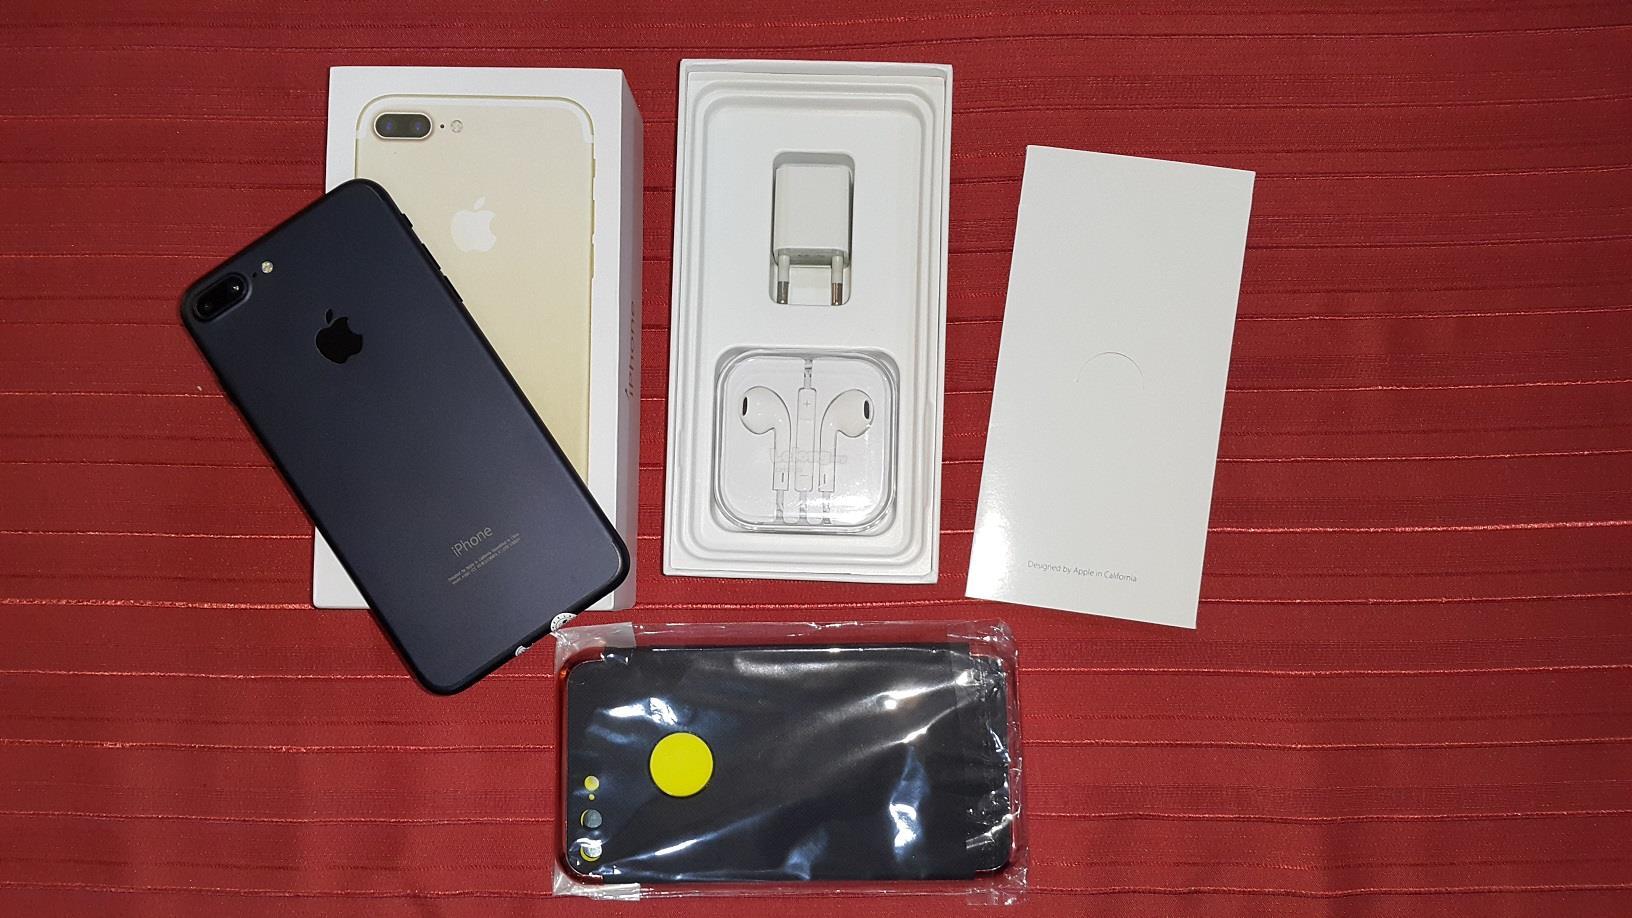 Apple iPhone 7 Plus Copy Clone 1:1 Smart Phone